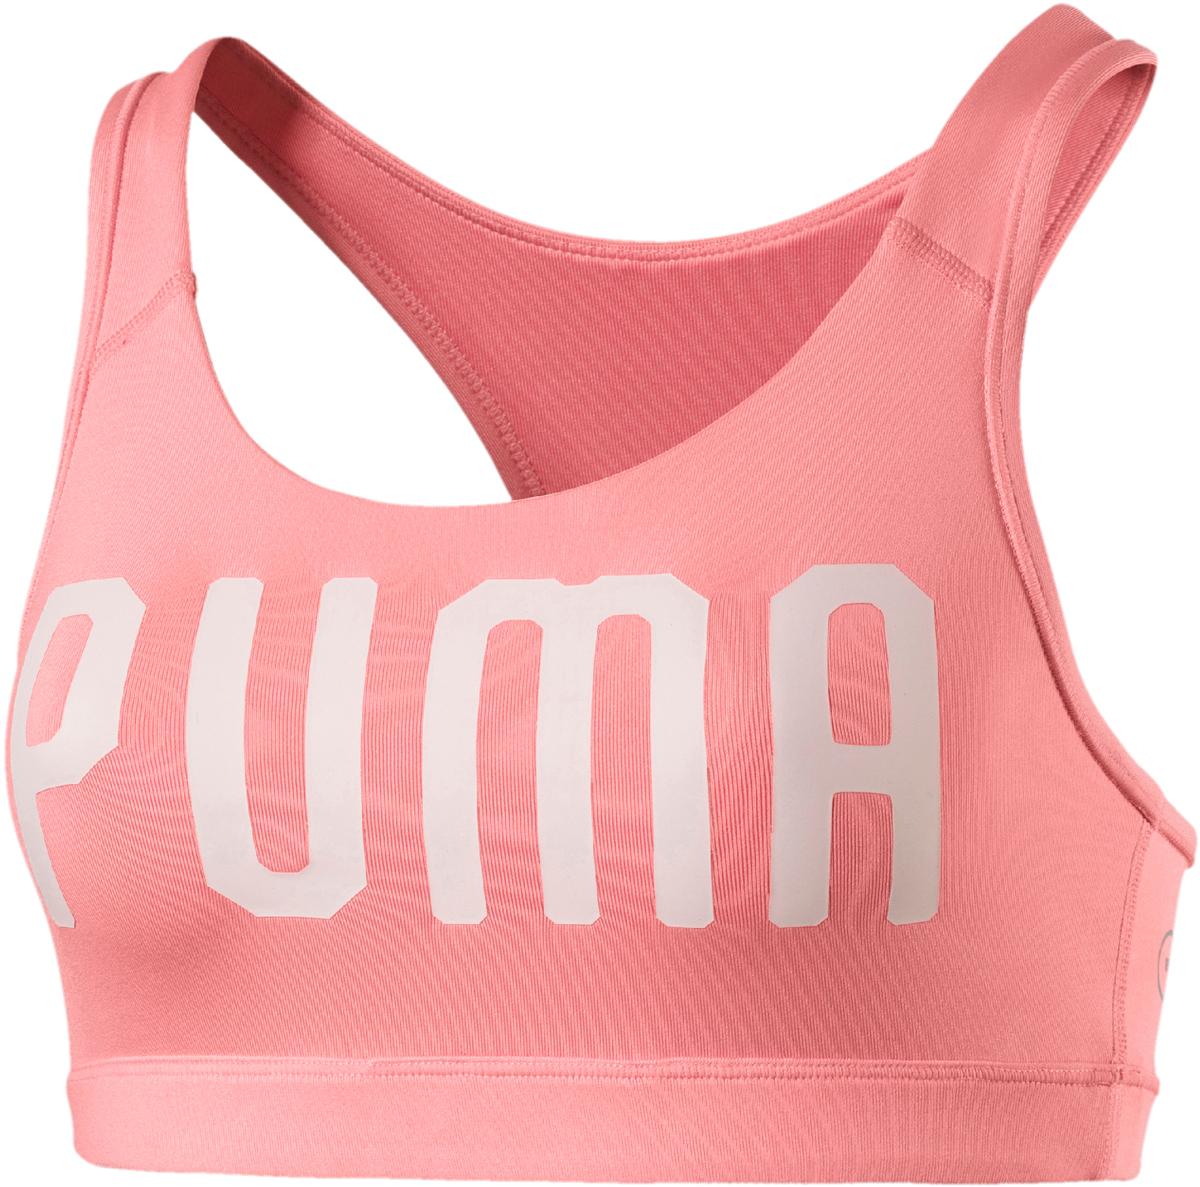 Топ-бра женский Puma Pwrshape Forever - Logo, цвет: коралловый. 51599121. Размер XL (48/50) топ puma топ essential layer tank graphic